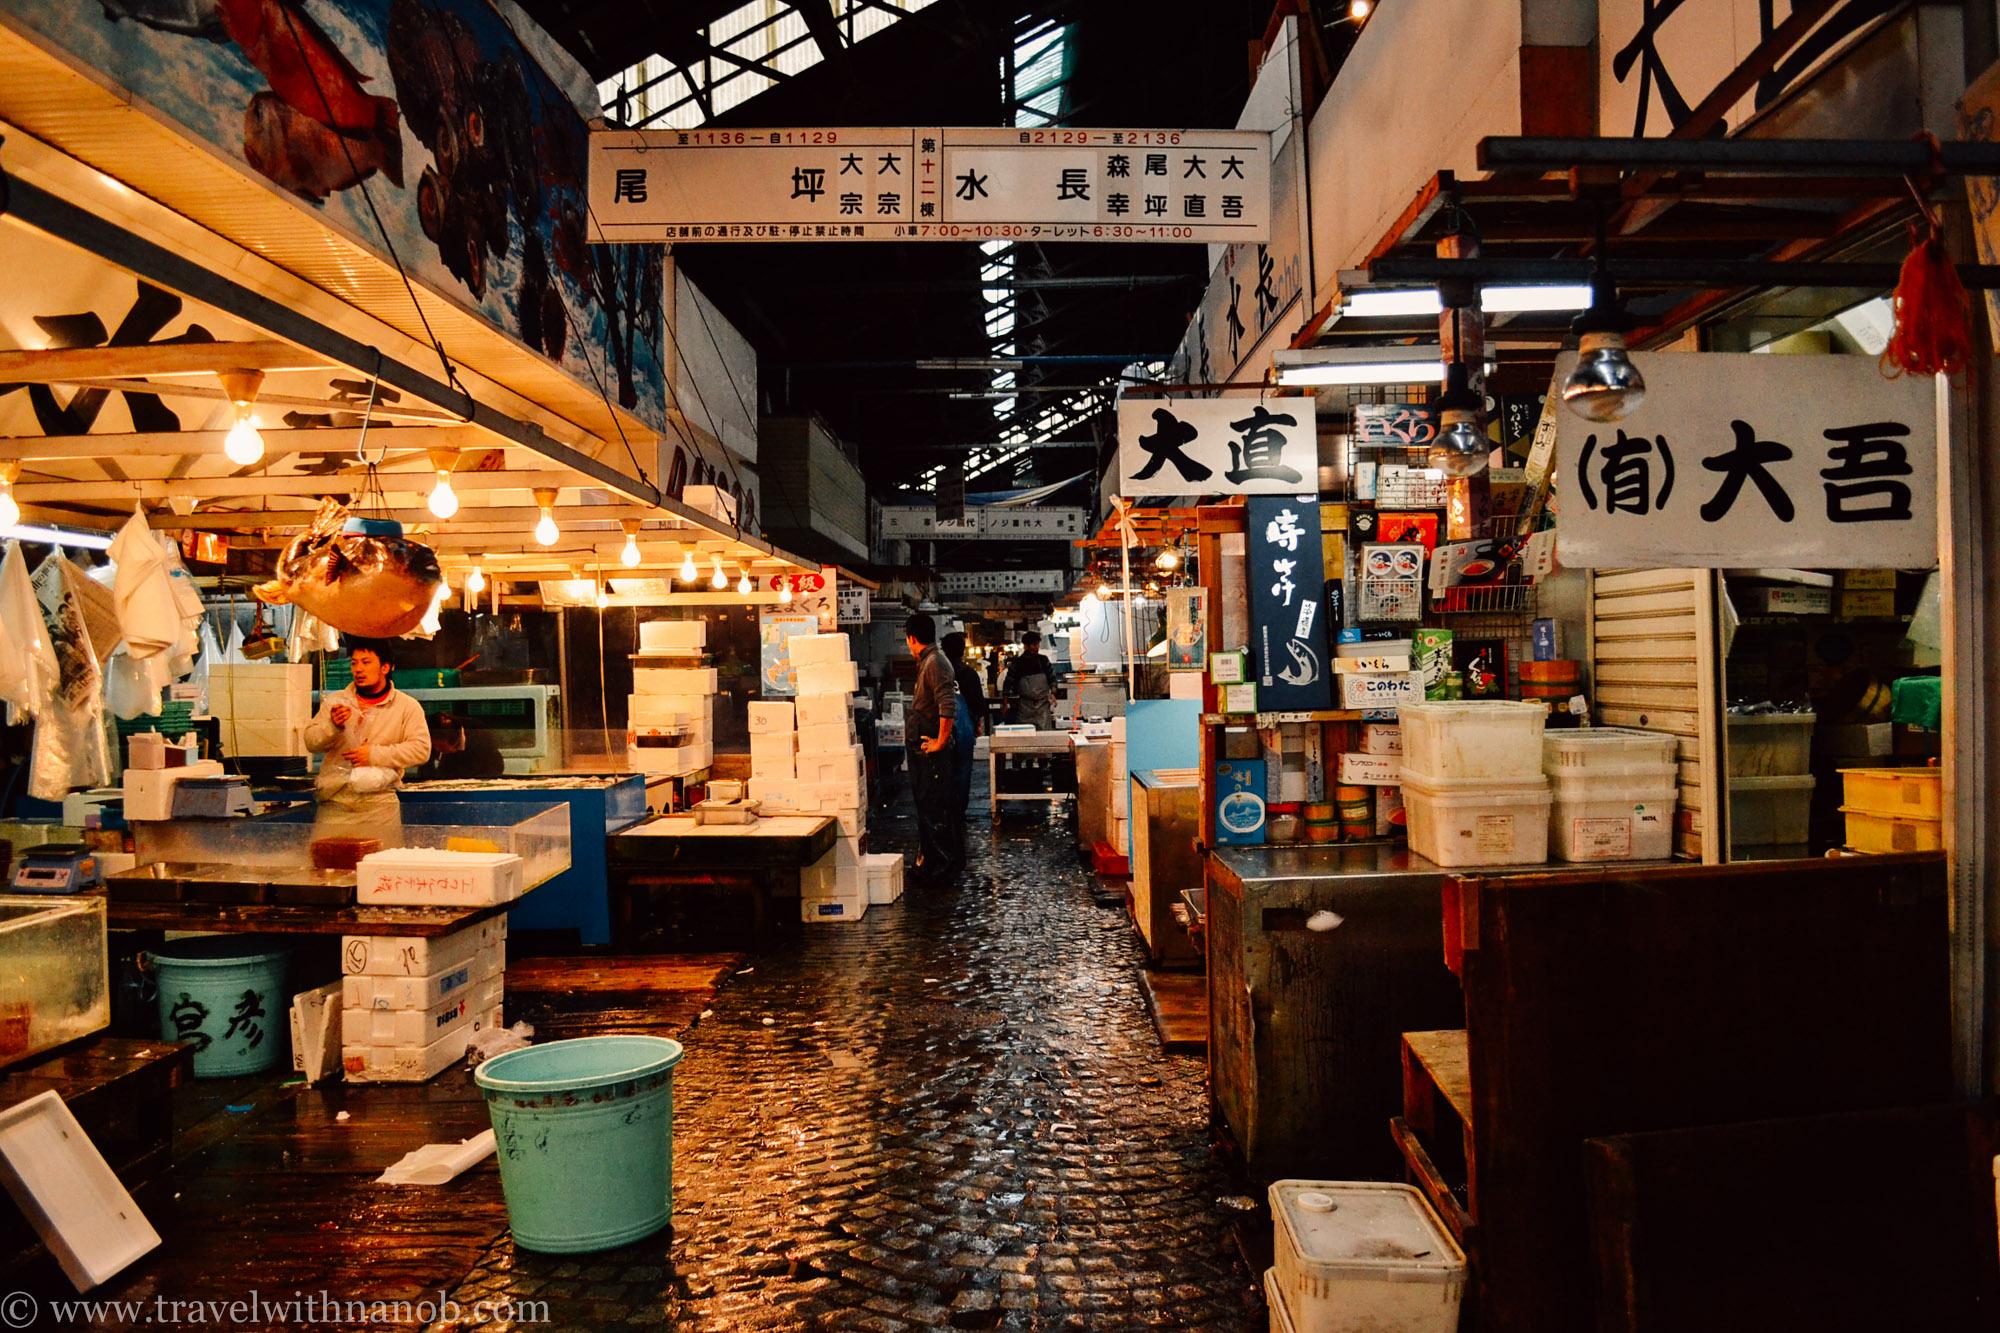 Guide to tsukiji fish market in tokyo travel with nano b for Japan fish market